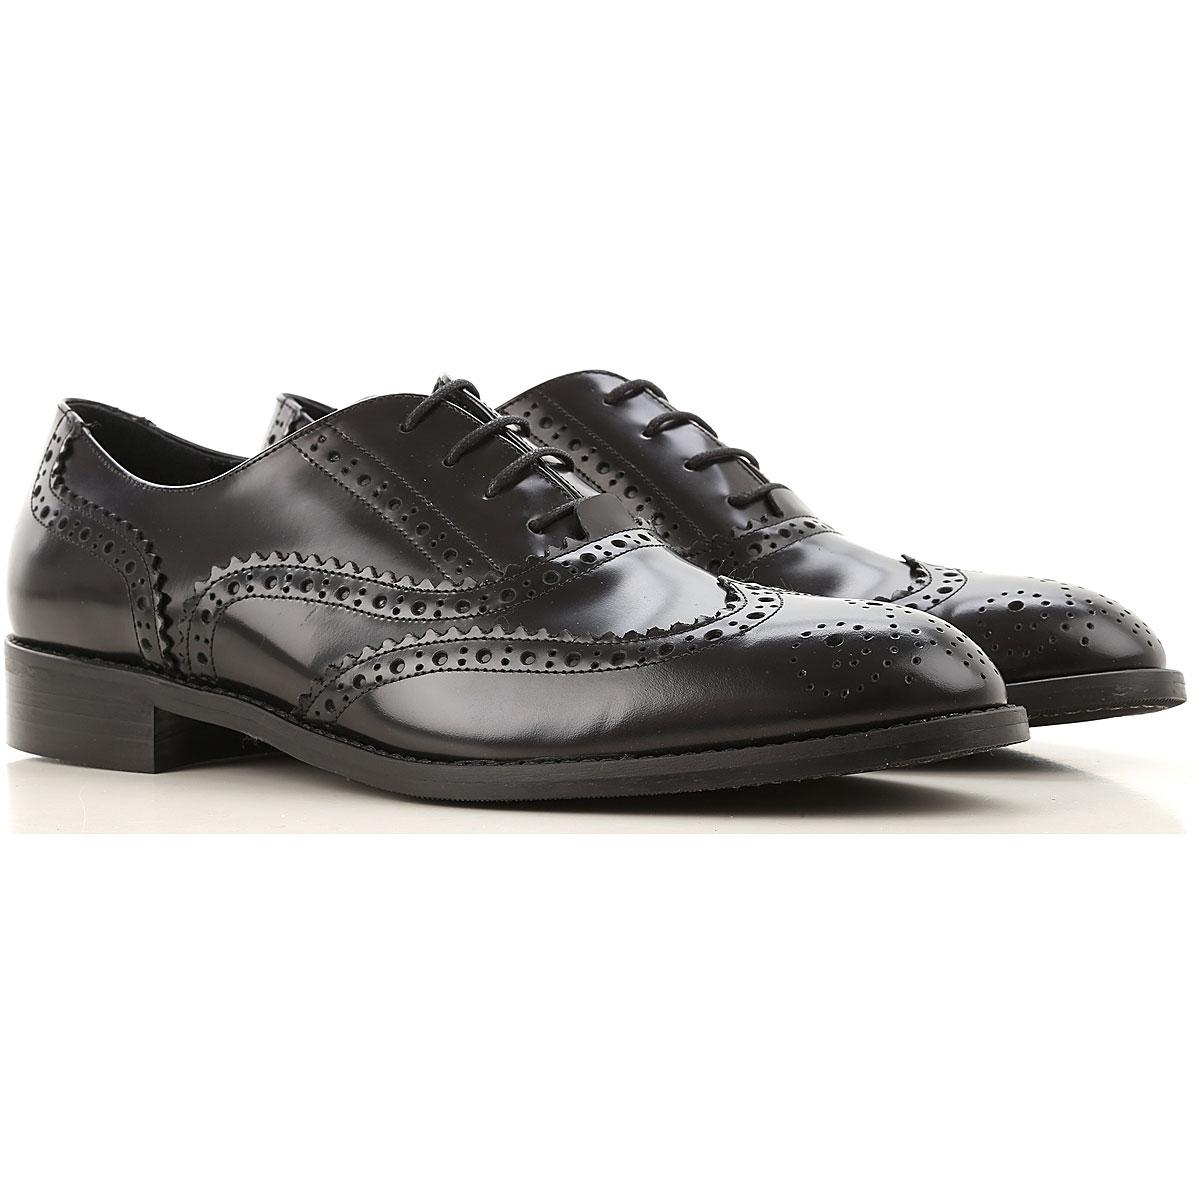 Guglielmo Rotta Womens Shoes On Sale, Black, Leather, 2019, 10 6 7 8 9